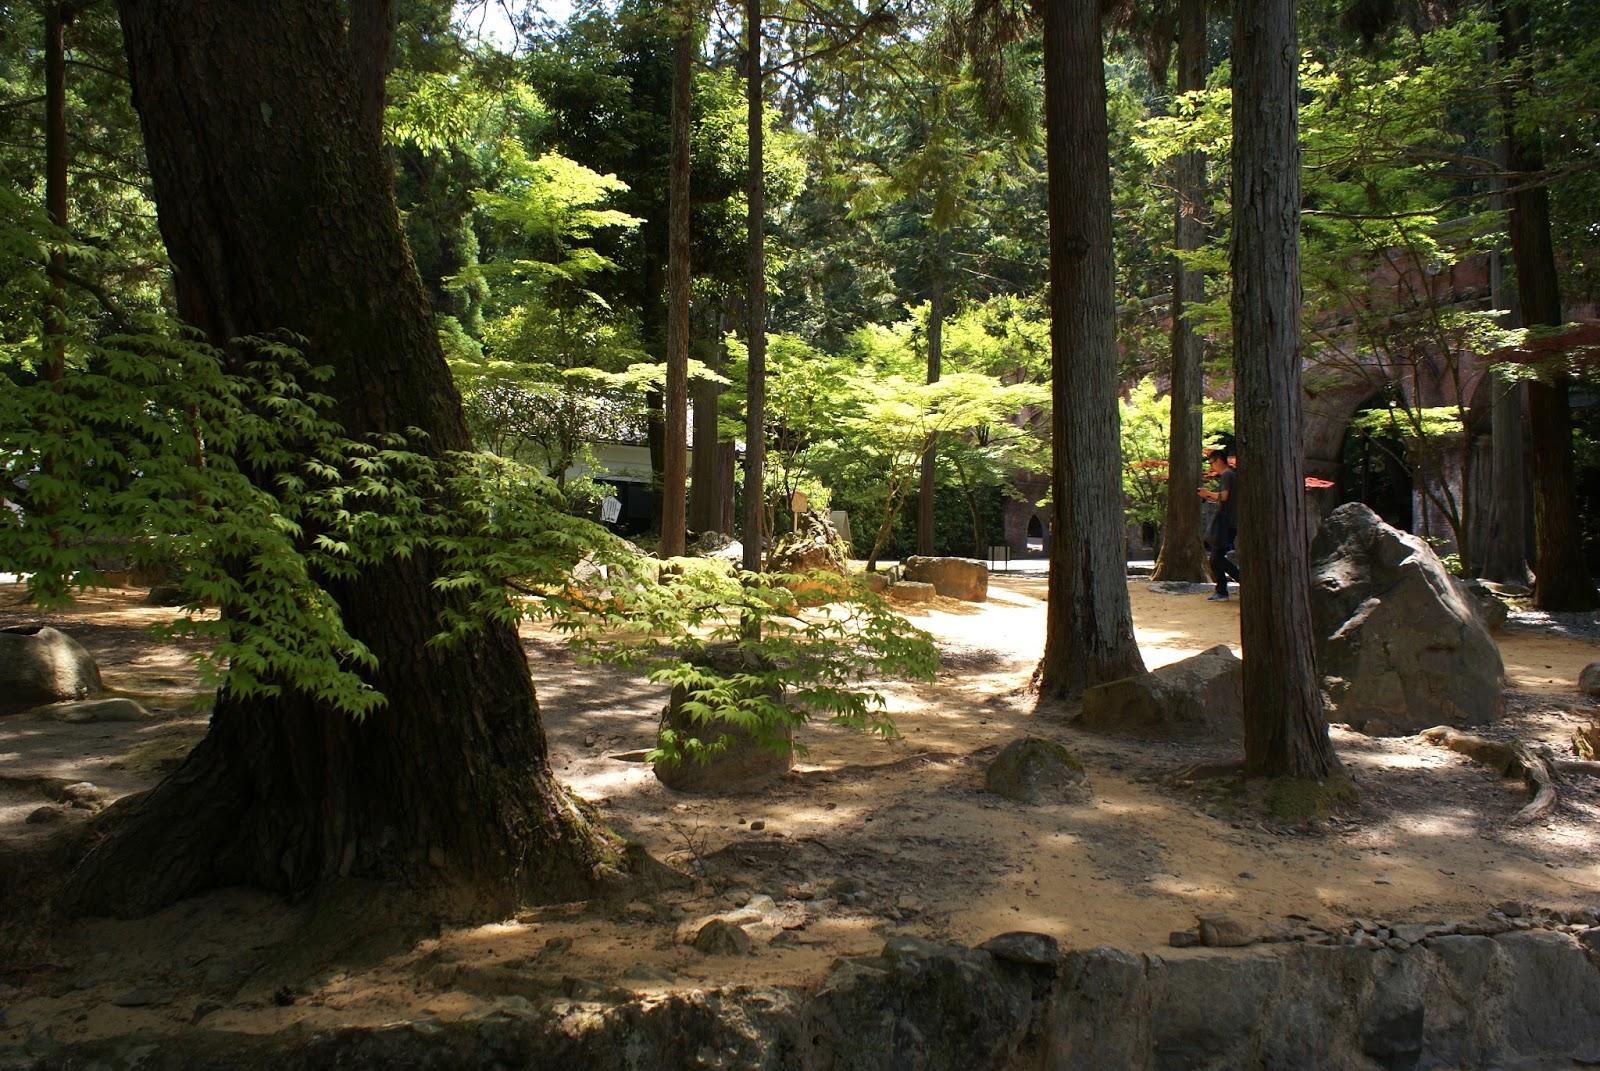 nanzen-ji buddhist temple kyoto japan